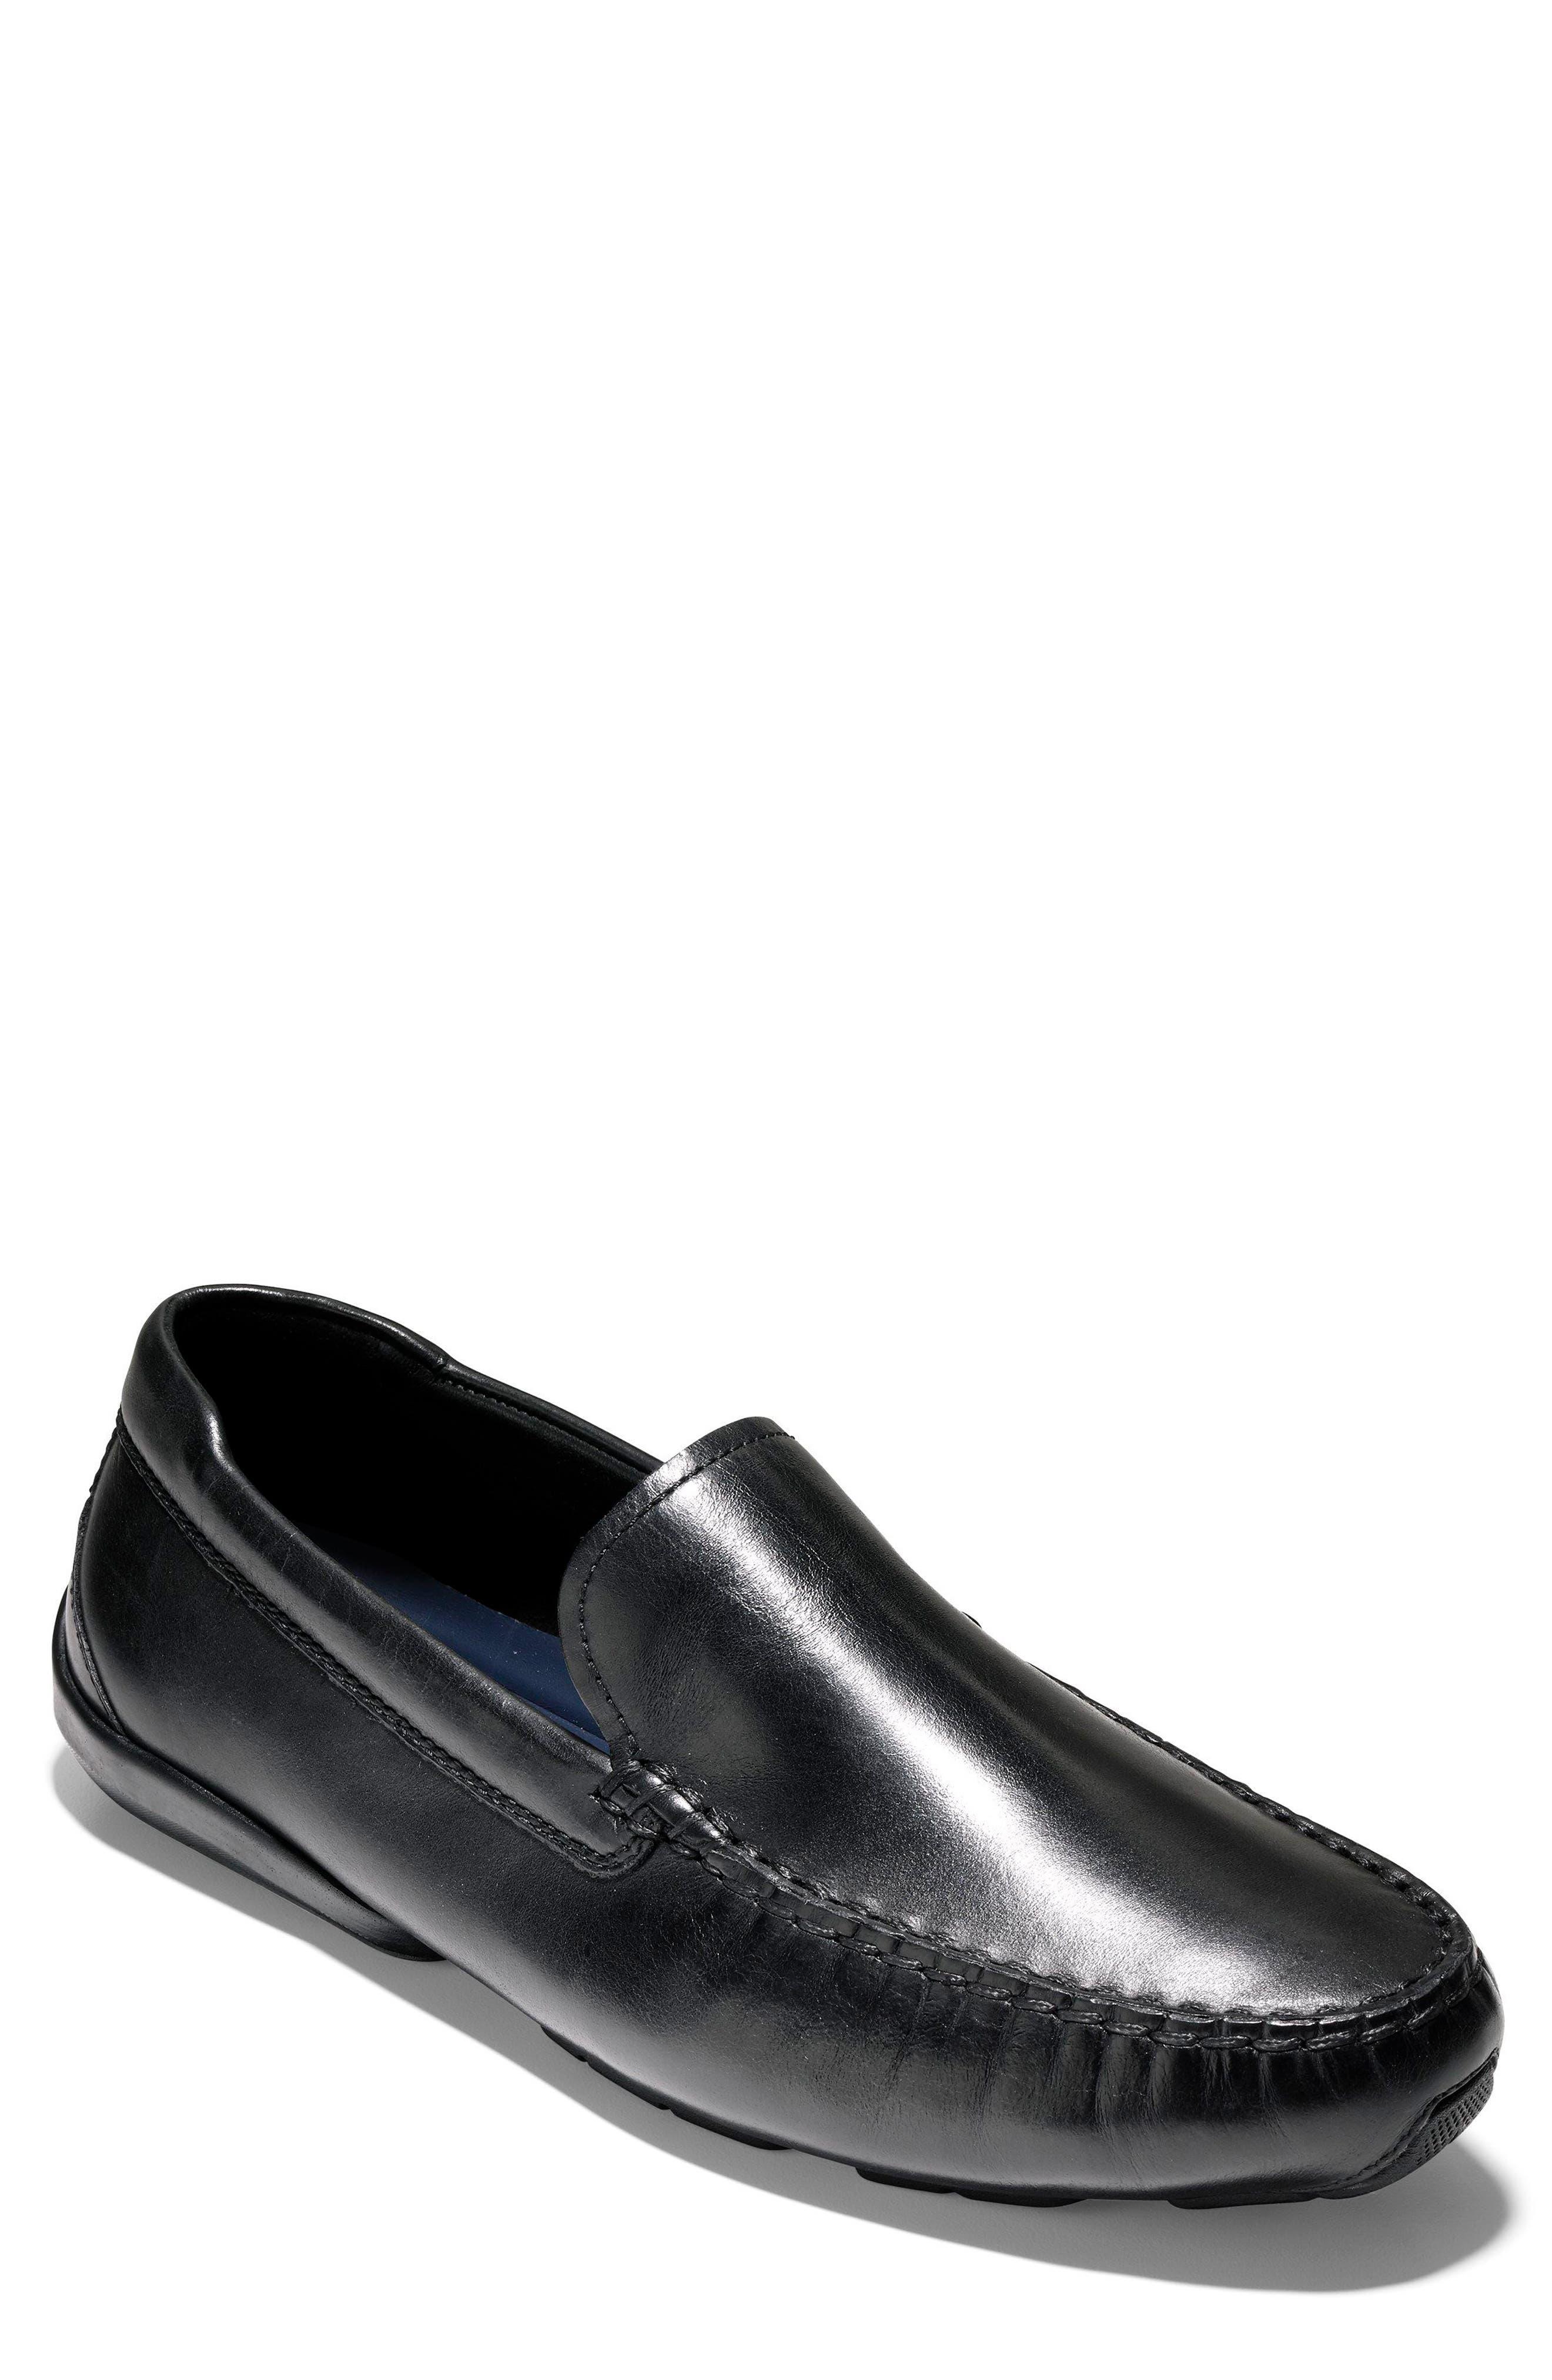 Branson Driving Shoe,                         Main,                         color, 001